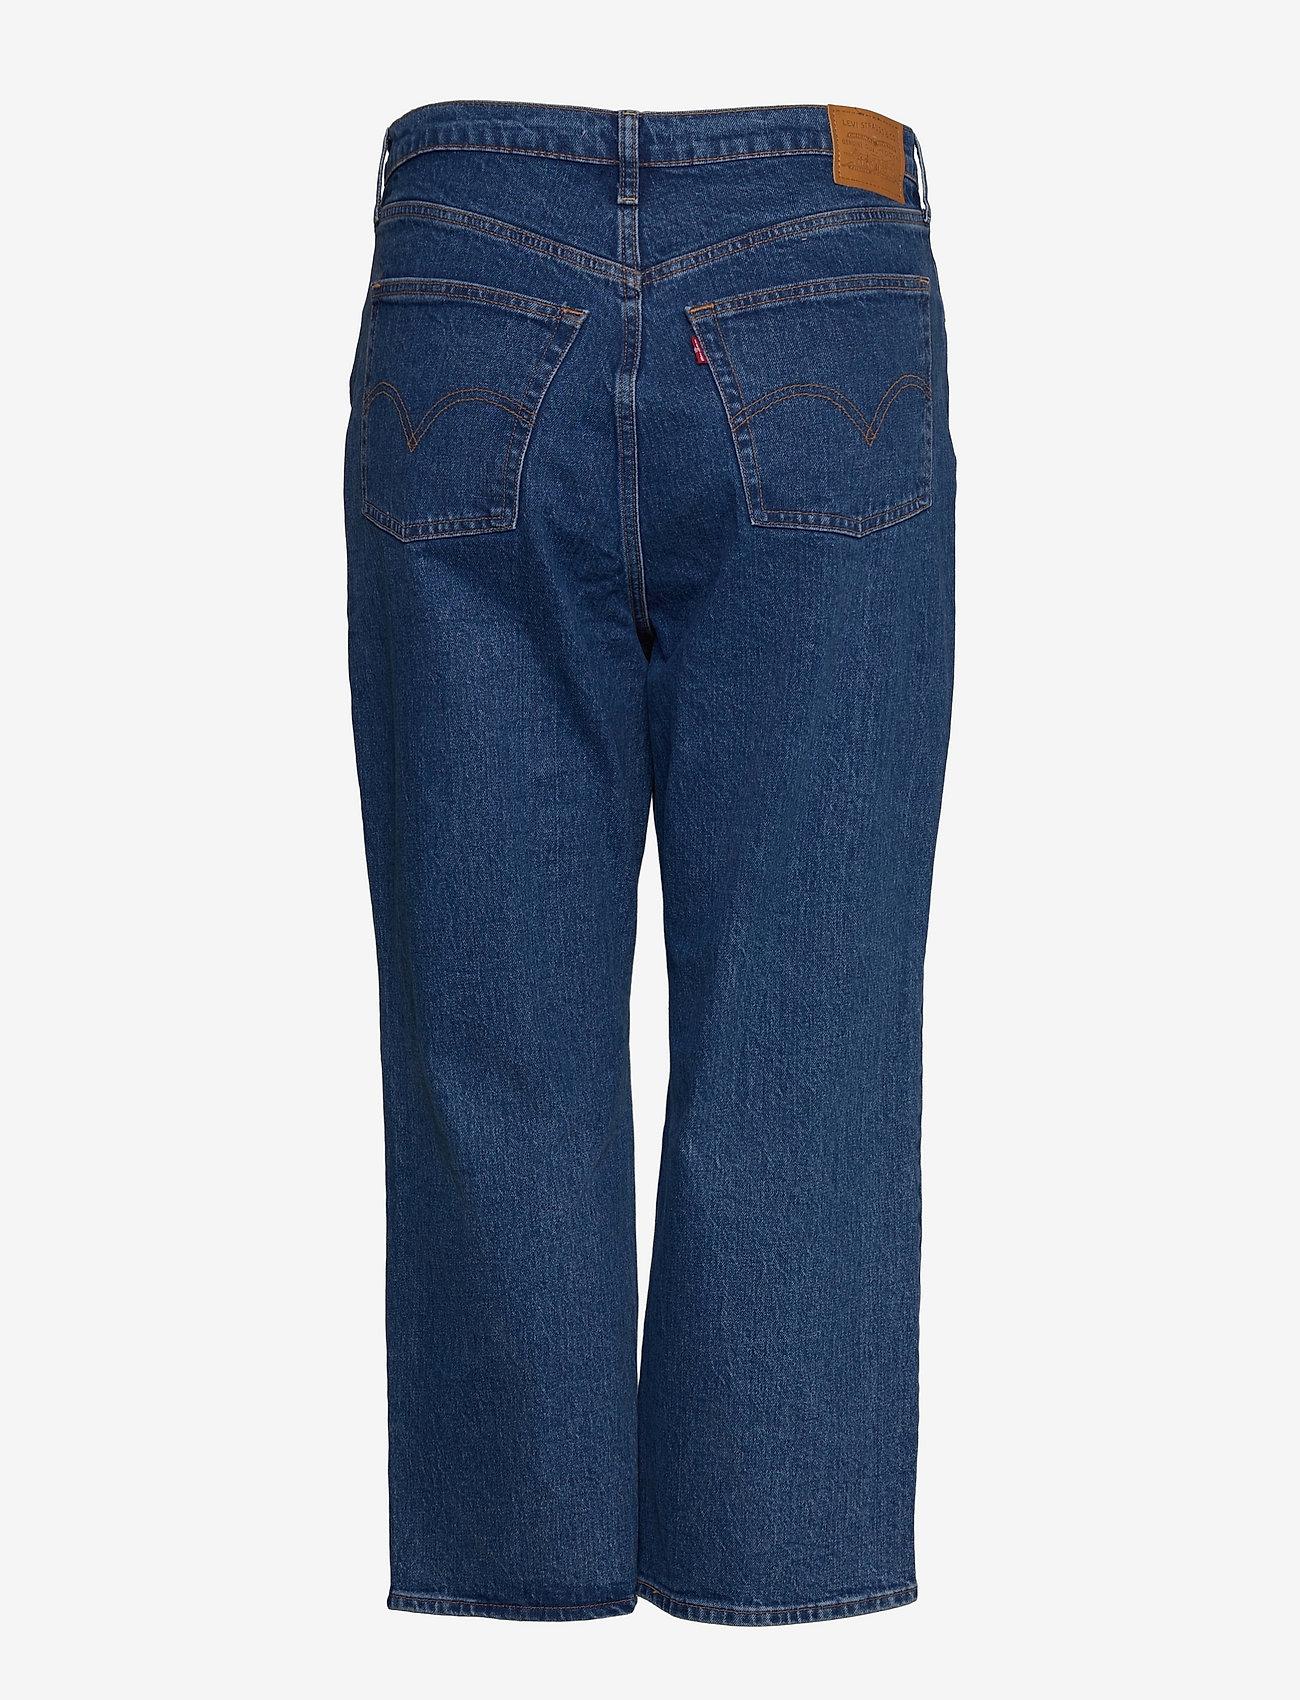 Levi's Plus Size - PL RIBCAGE STRAIGHT ANK JAZZ G - straight jeans - med indigo - flat finish - 1